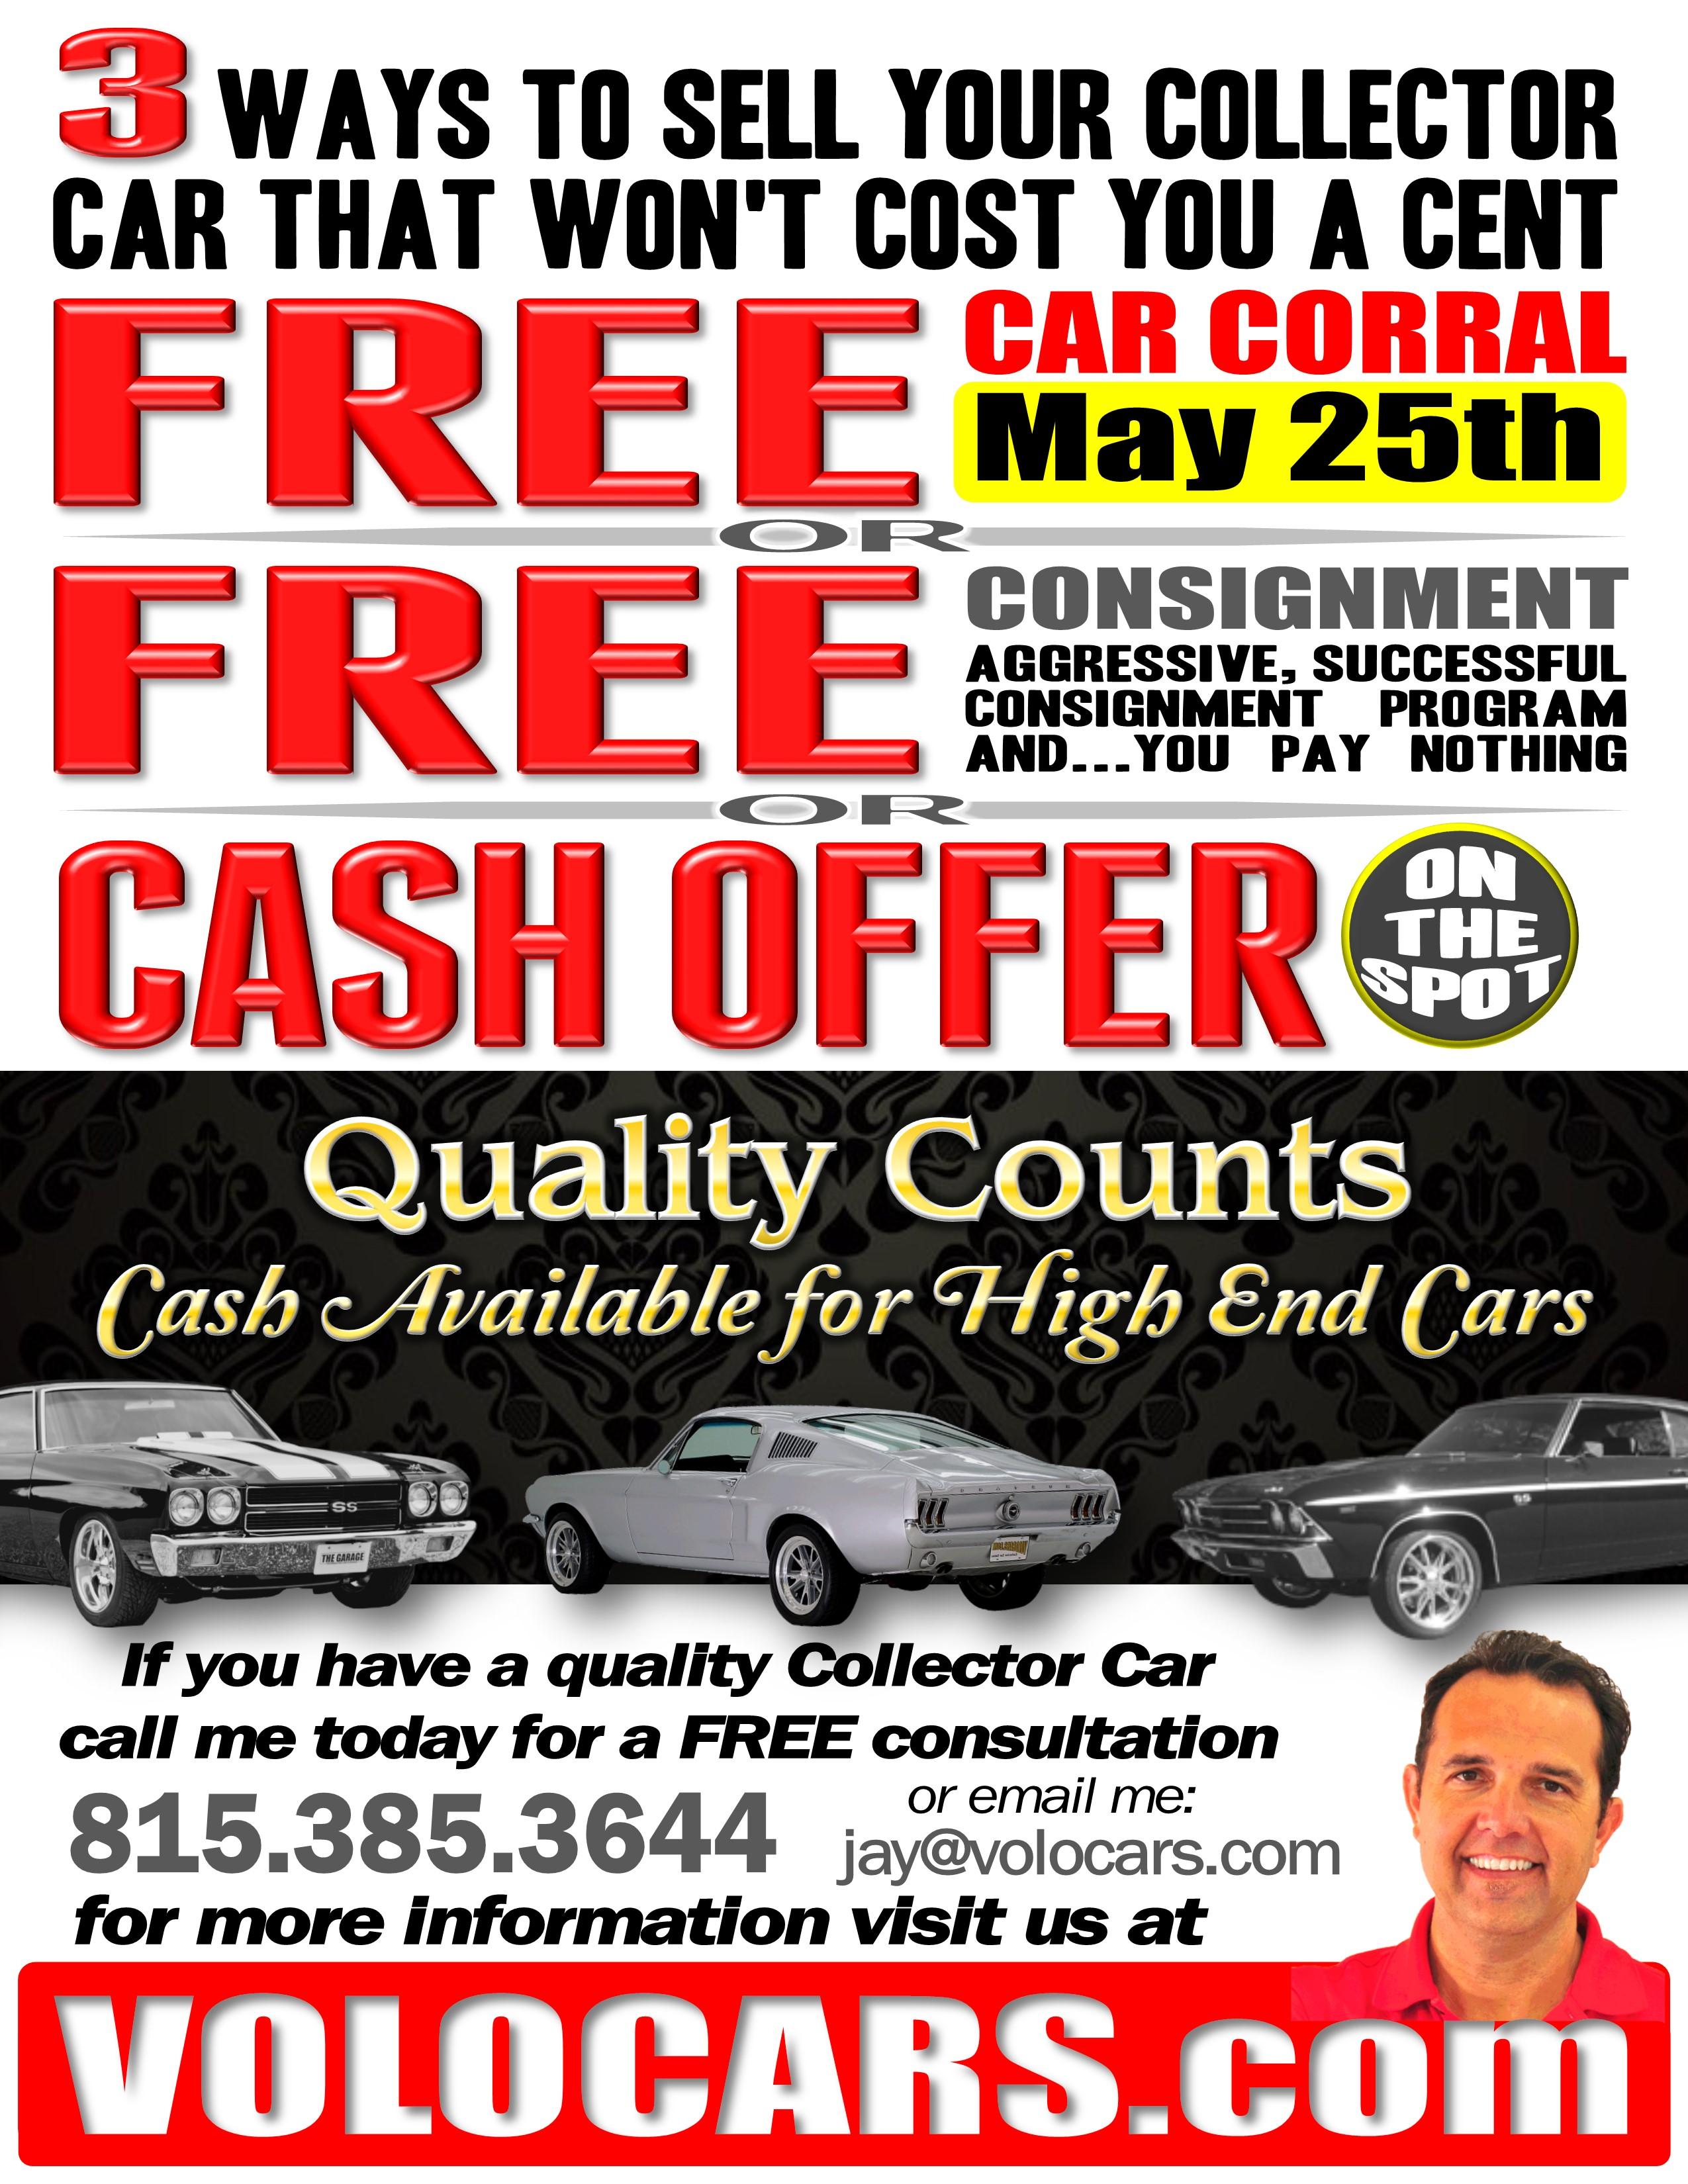 Car Corral Cancelled